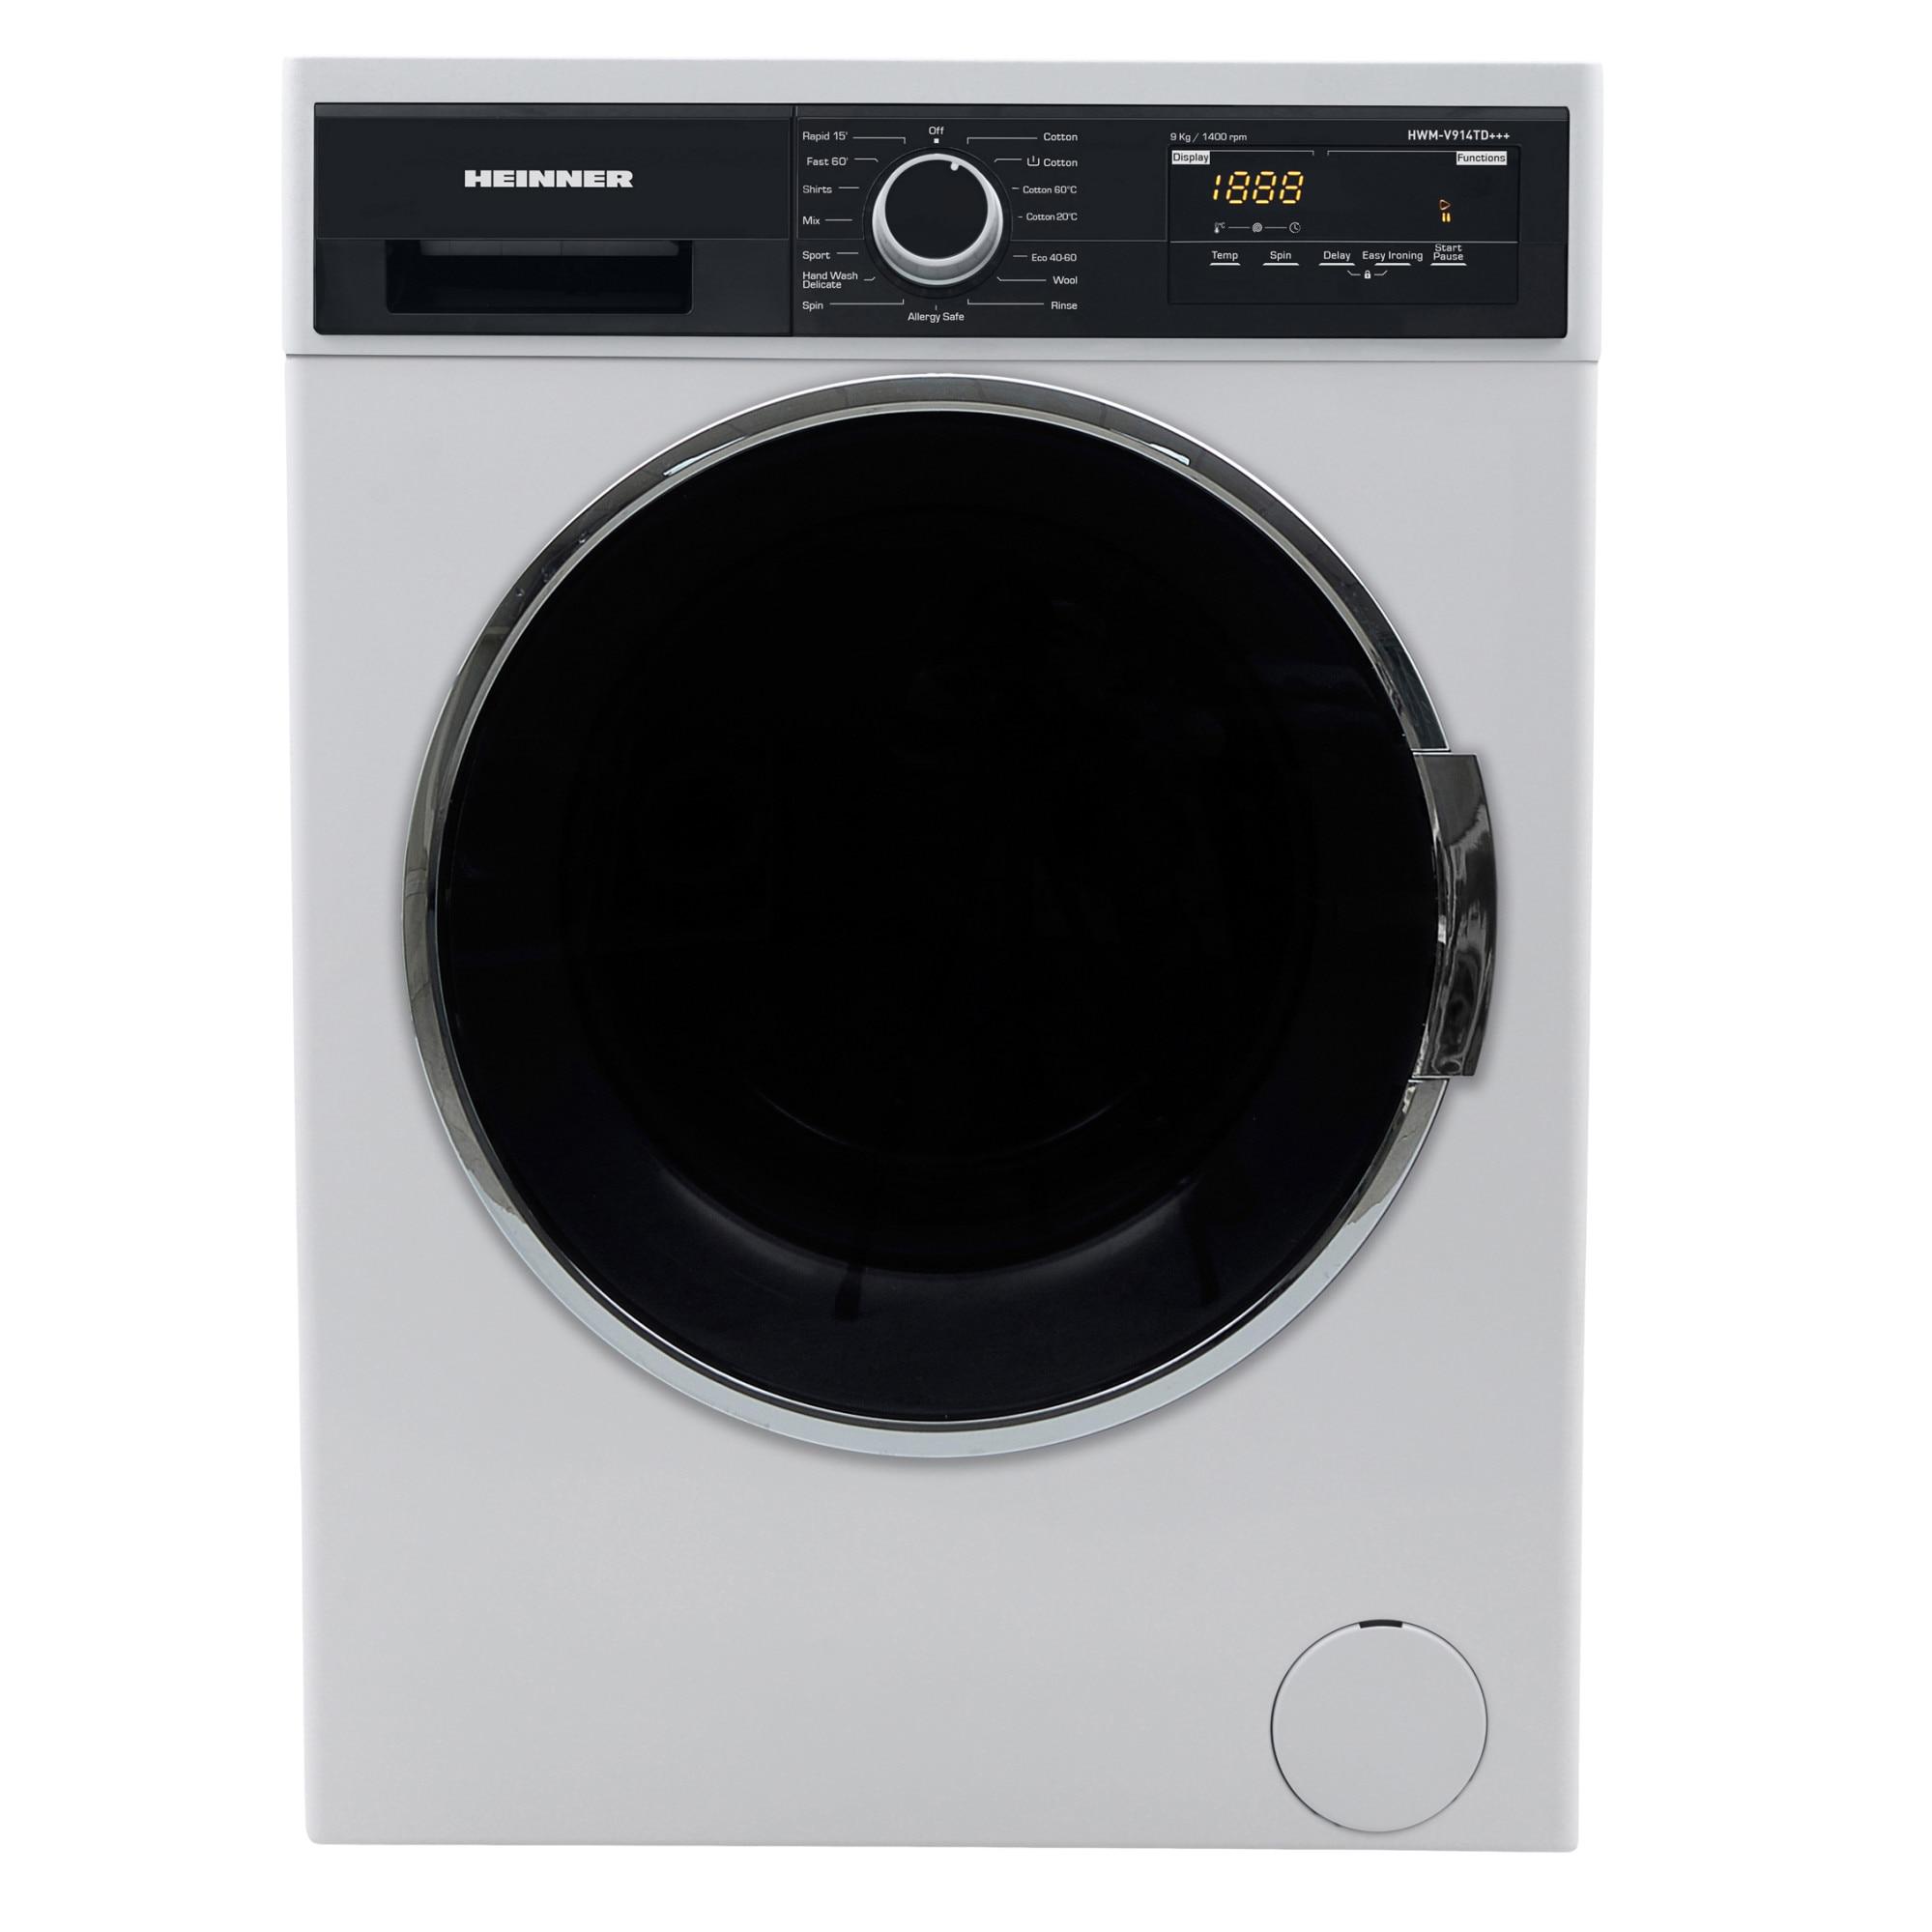 Fotografie Masina de spalat Heinner HWM-V914TD+++, 9 kg, 1400 RPM, Clasa A+++, Display LED, Control Touch 60 cm, Alb